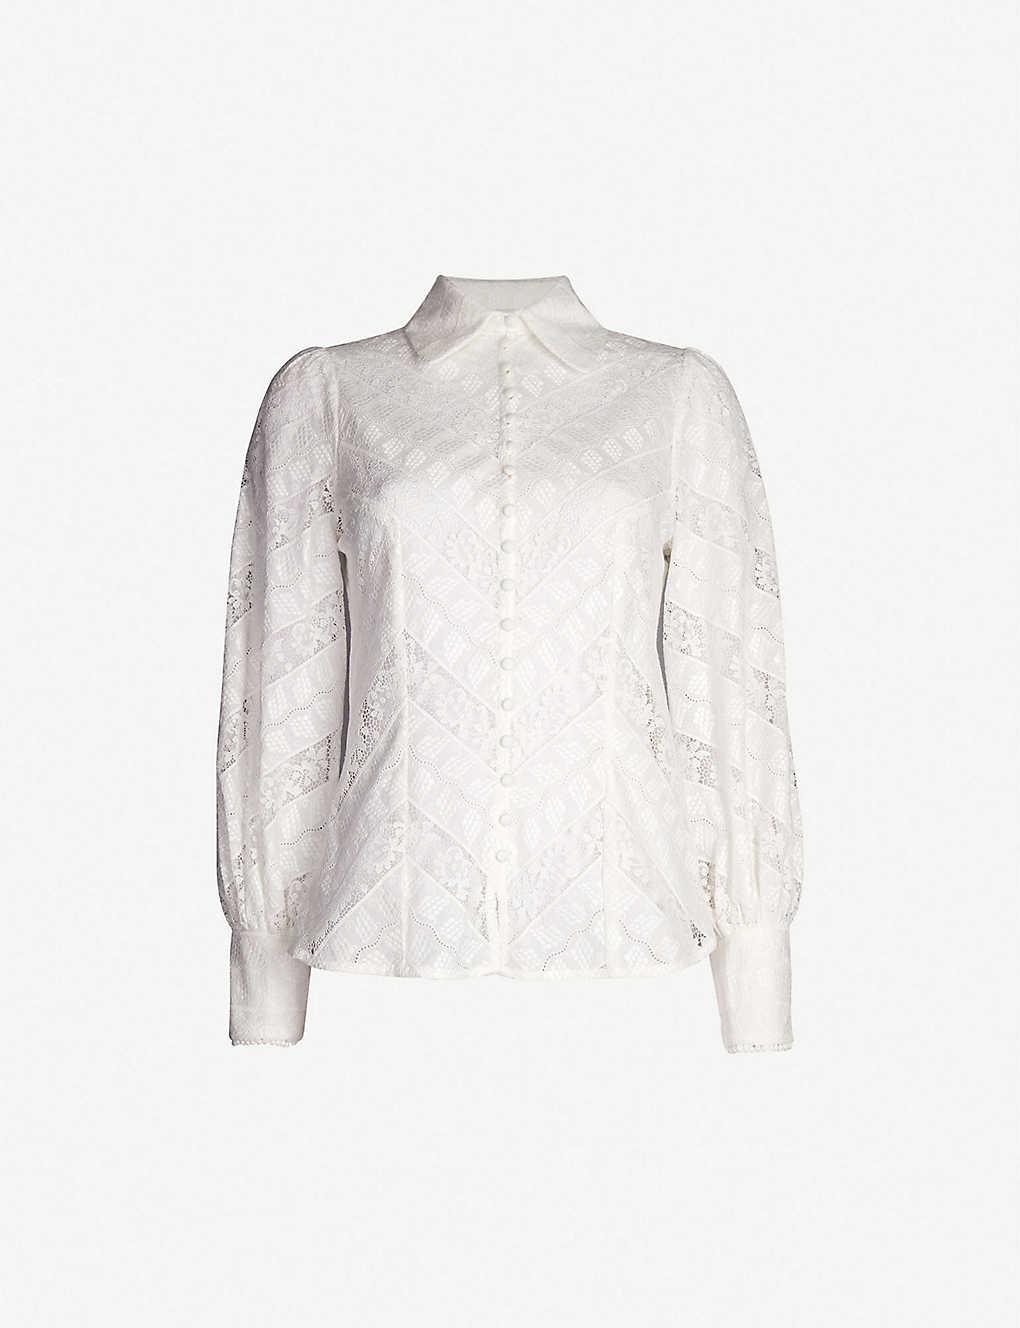 Ruffled Lace Shirt